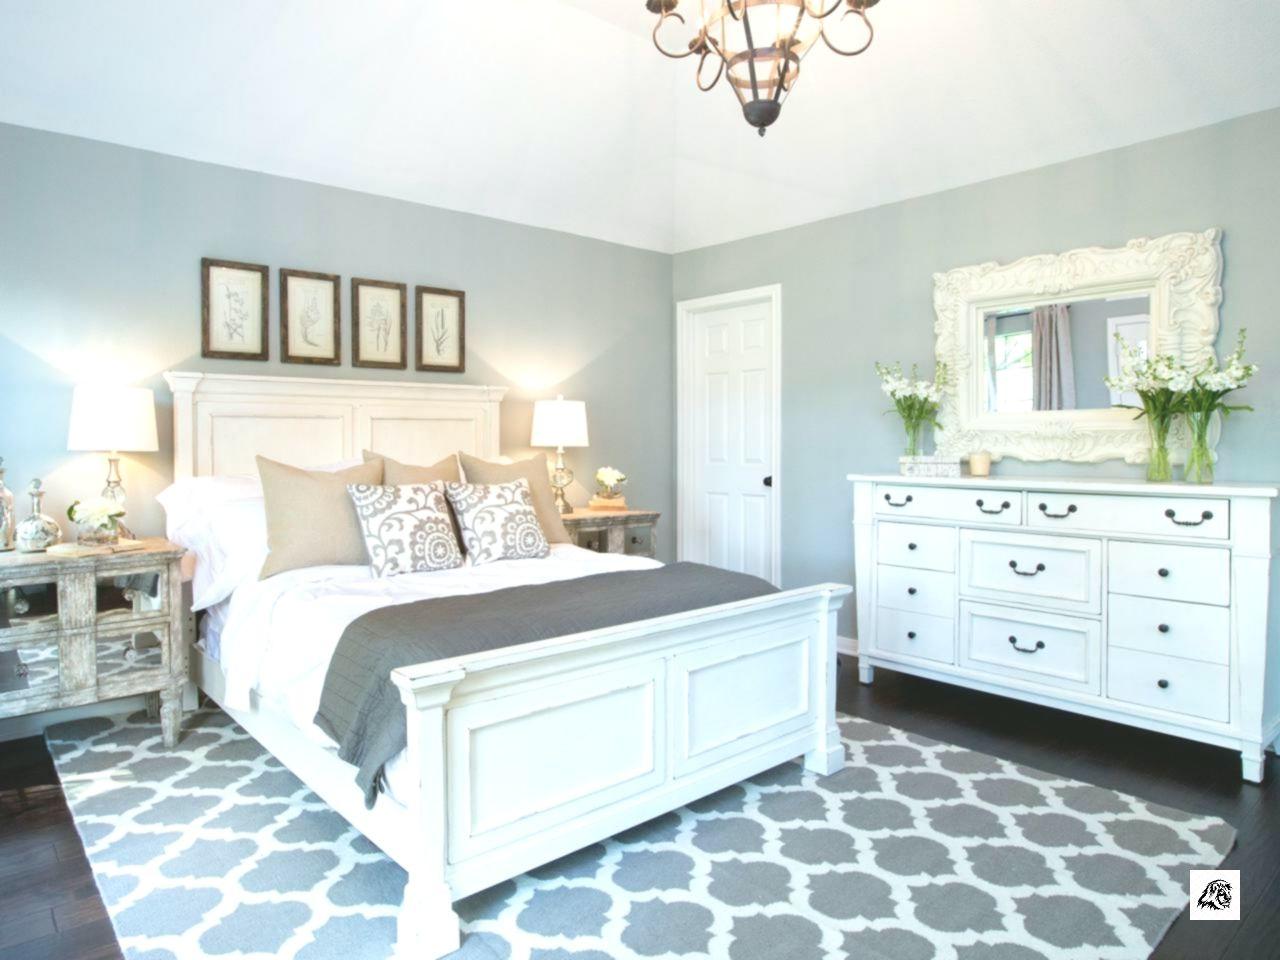 bedroom furniture ideas bedroom inspo white bedroom furniture rh in pinterest com